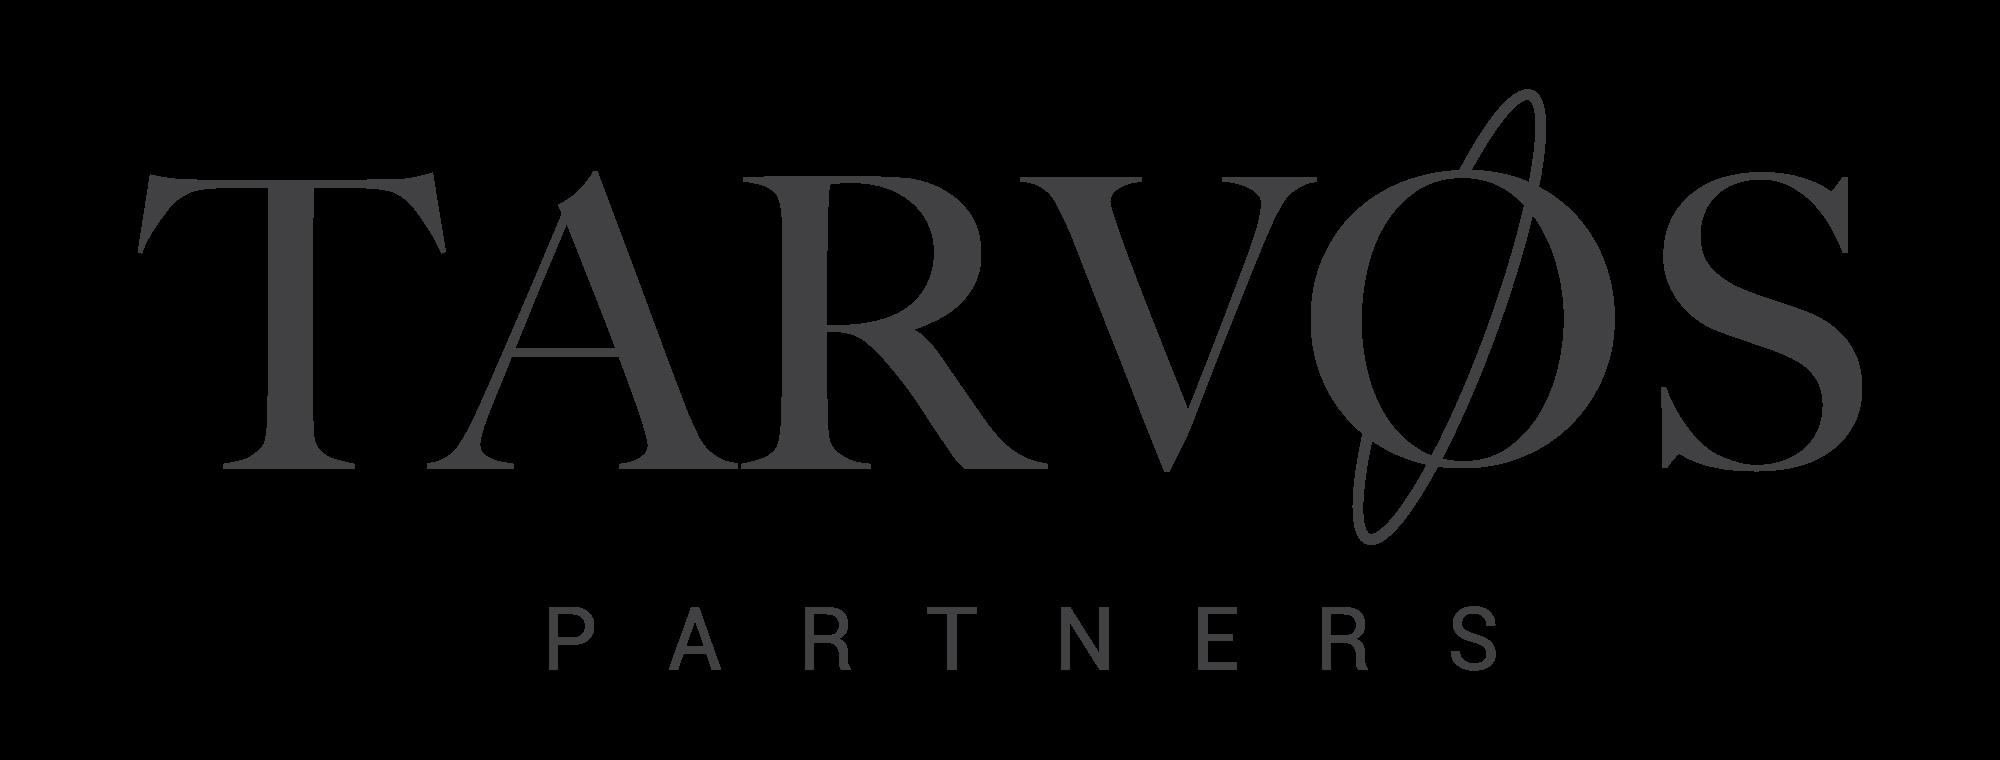 Tarvos Partners